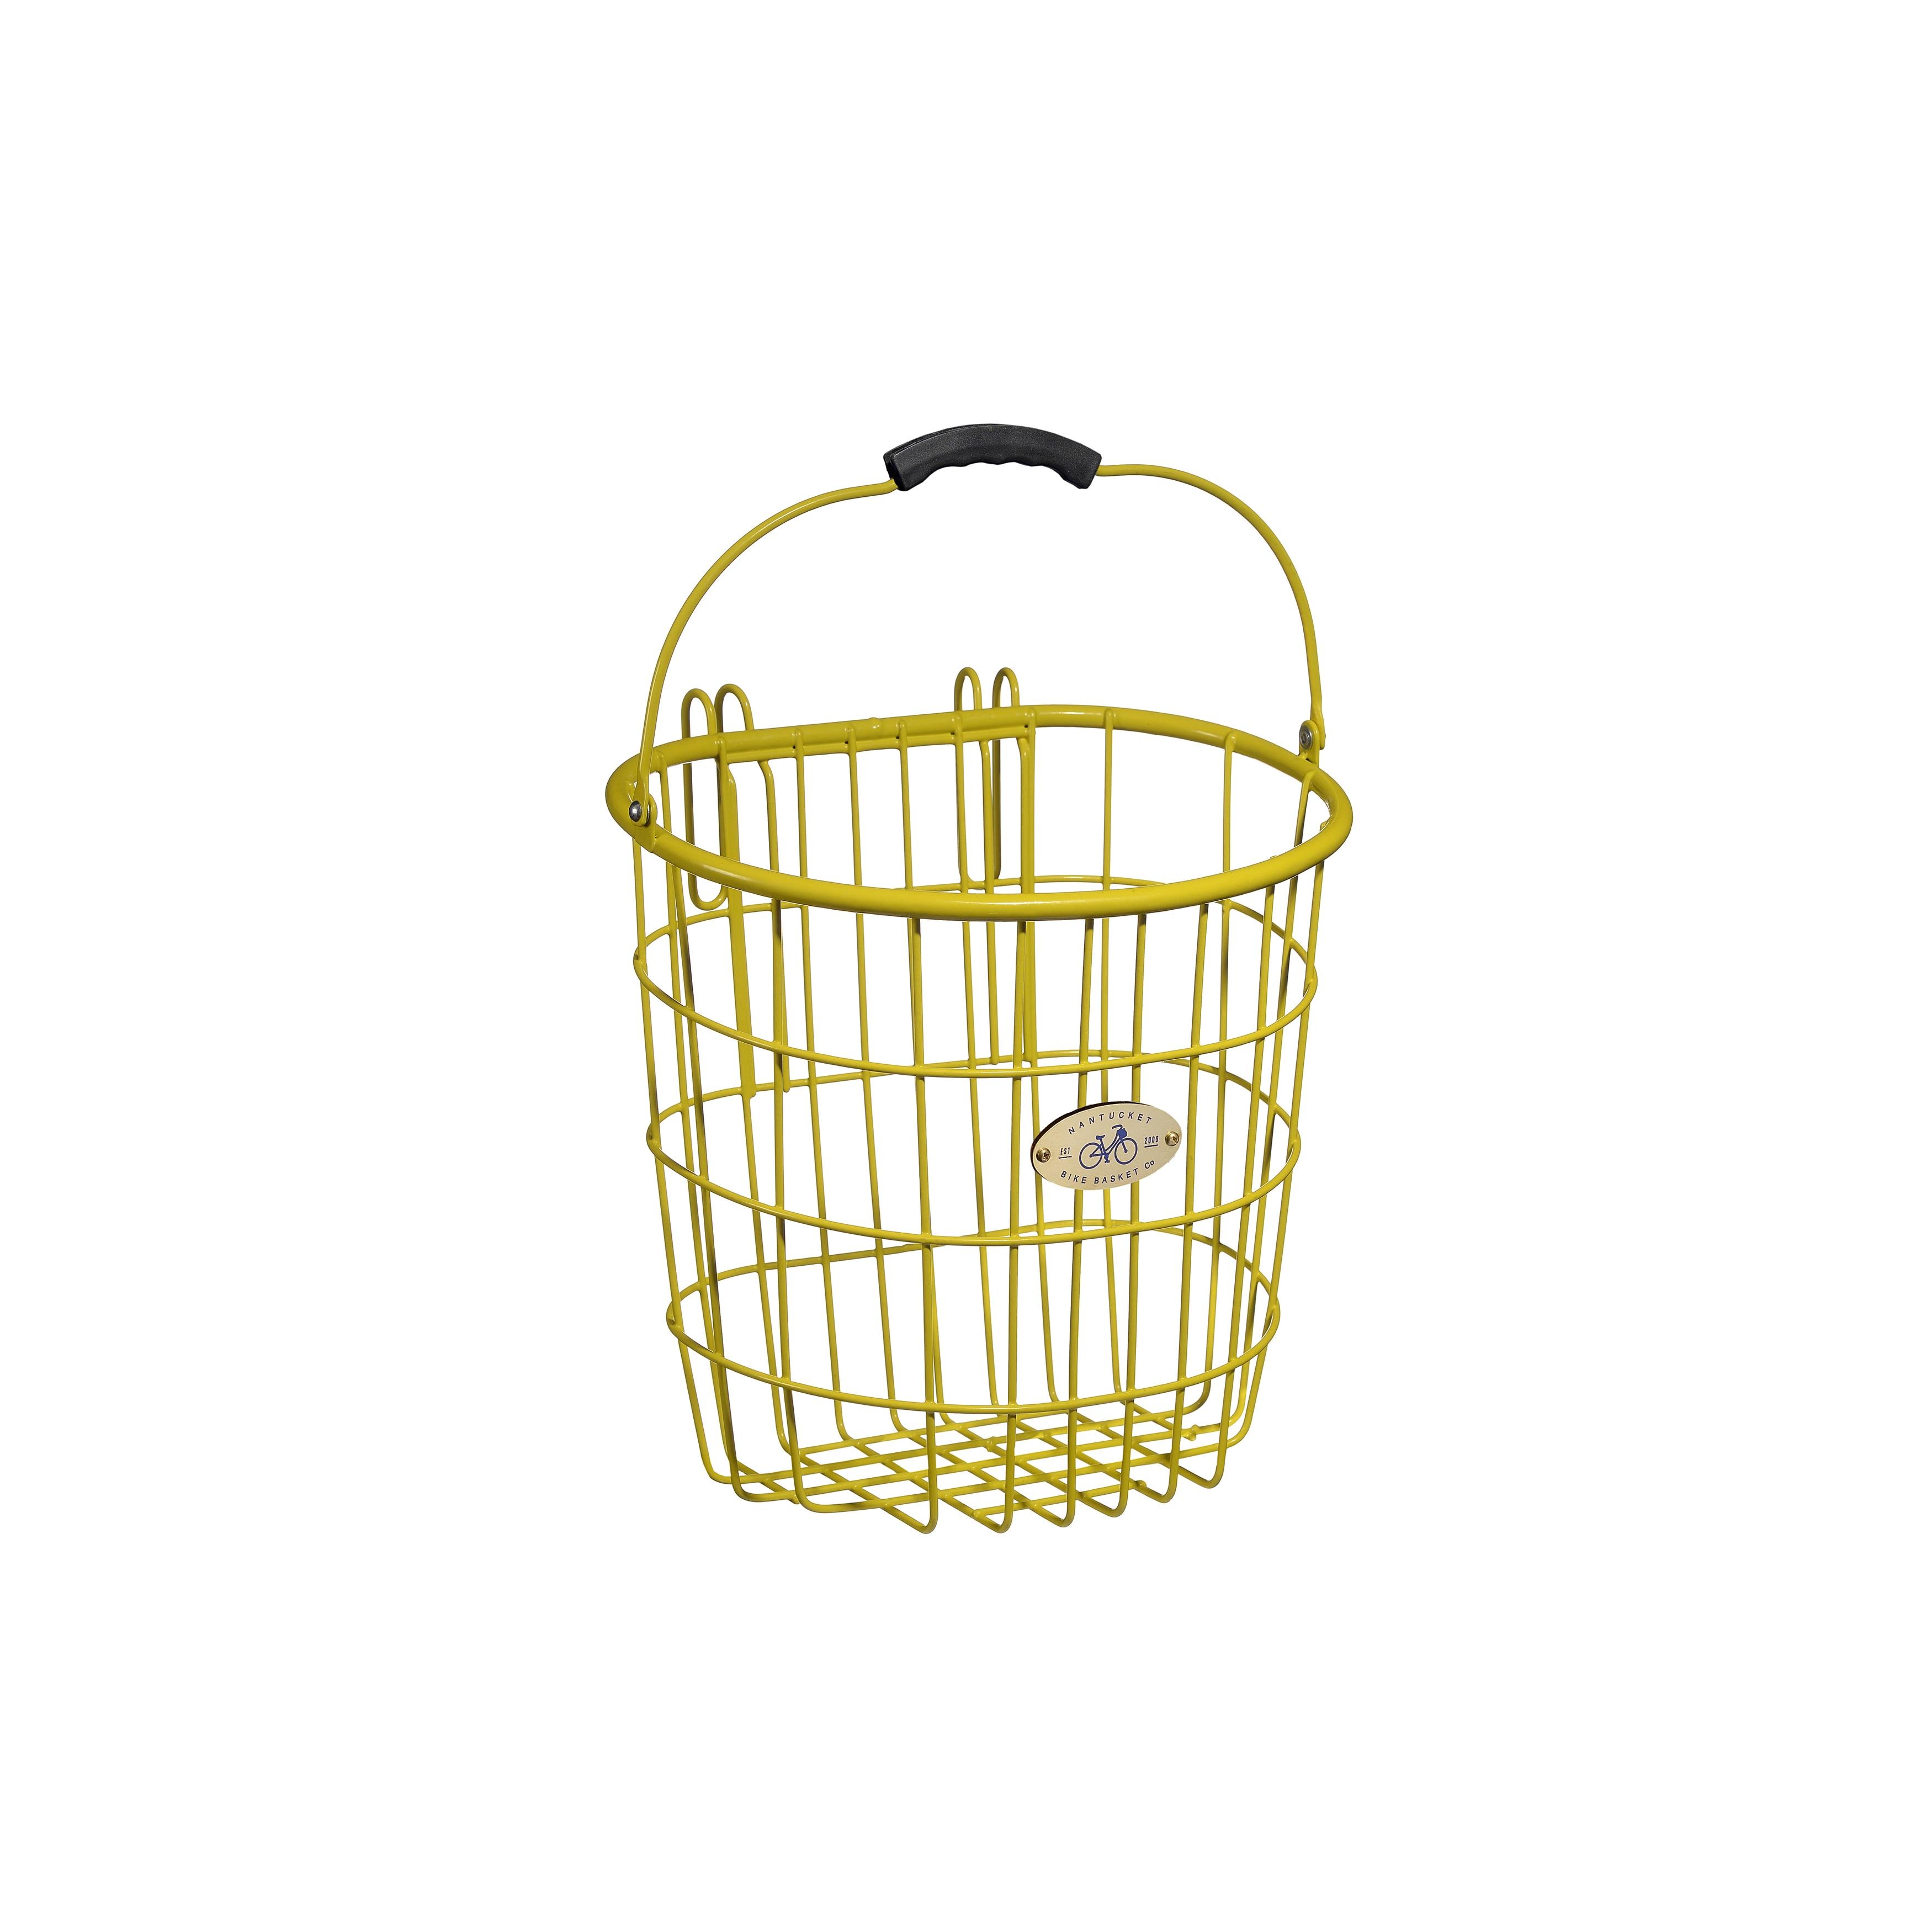 Nantucket Bicycle Basket Co. Surfside Rear Wire Pannier B...